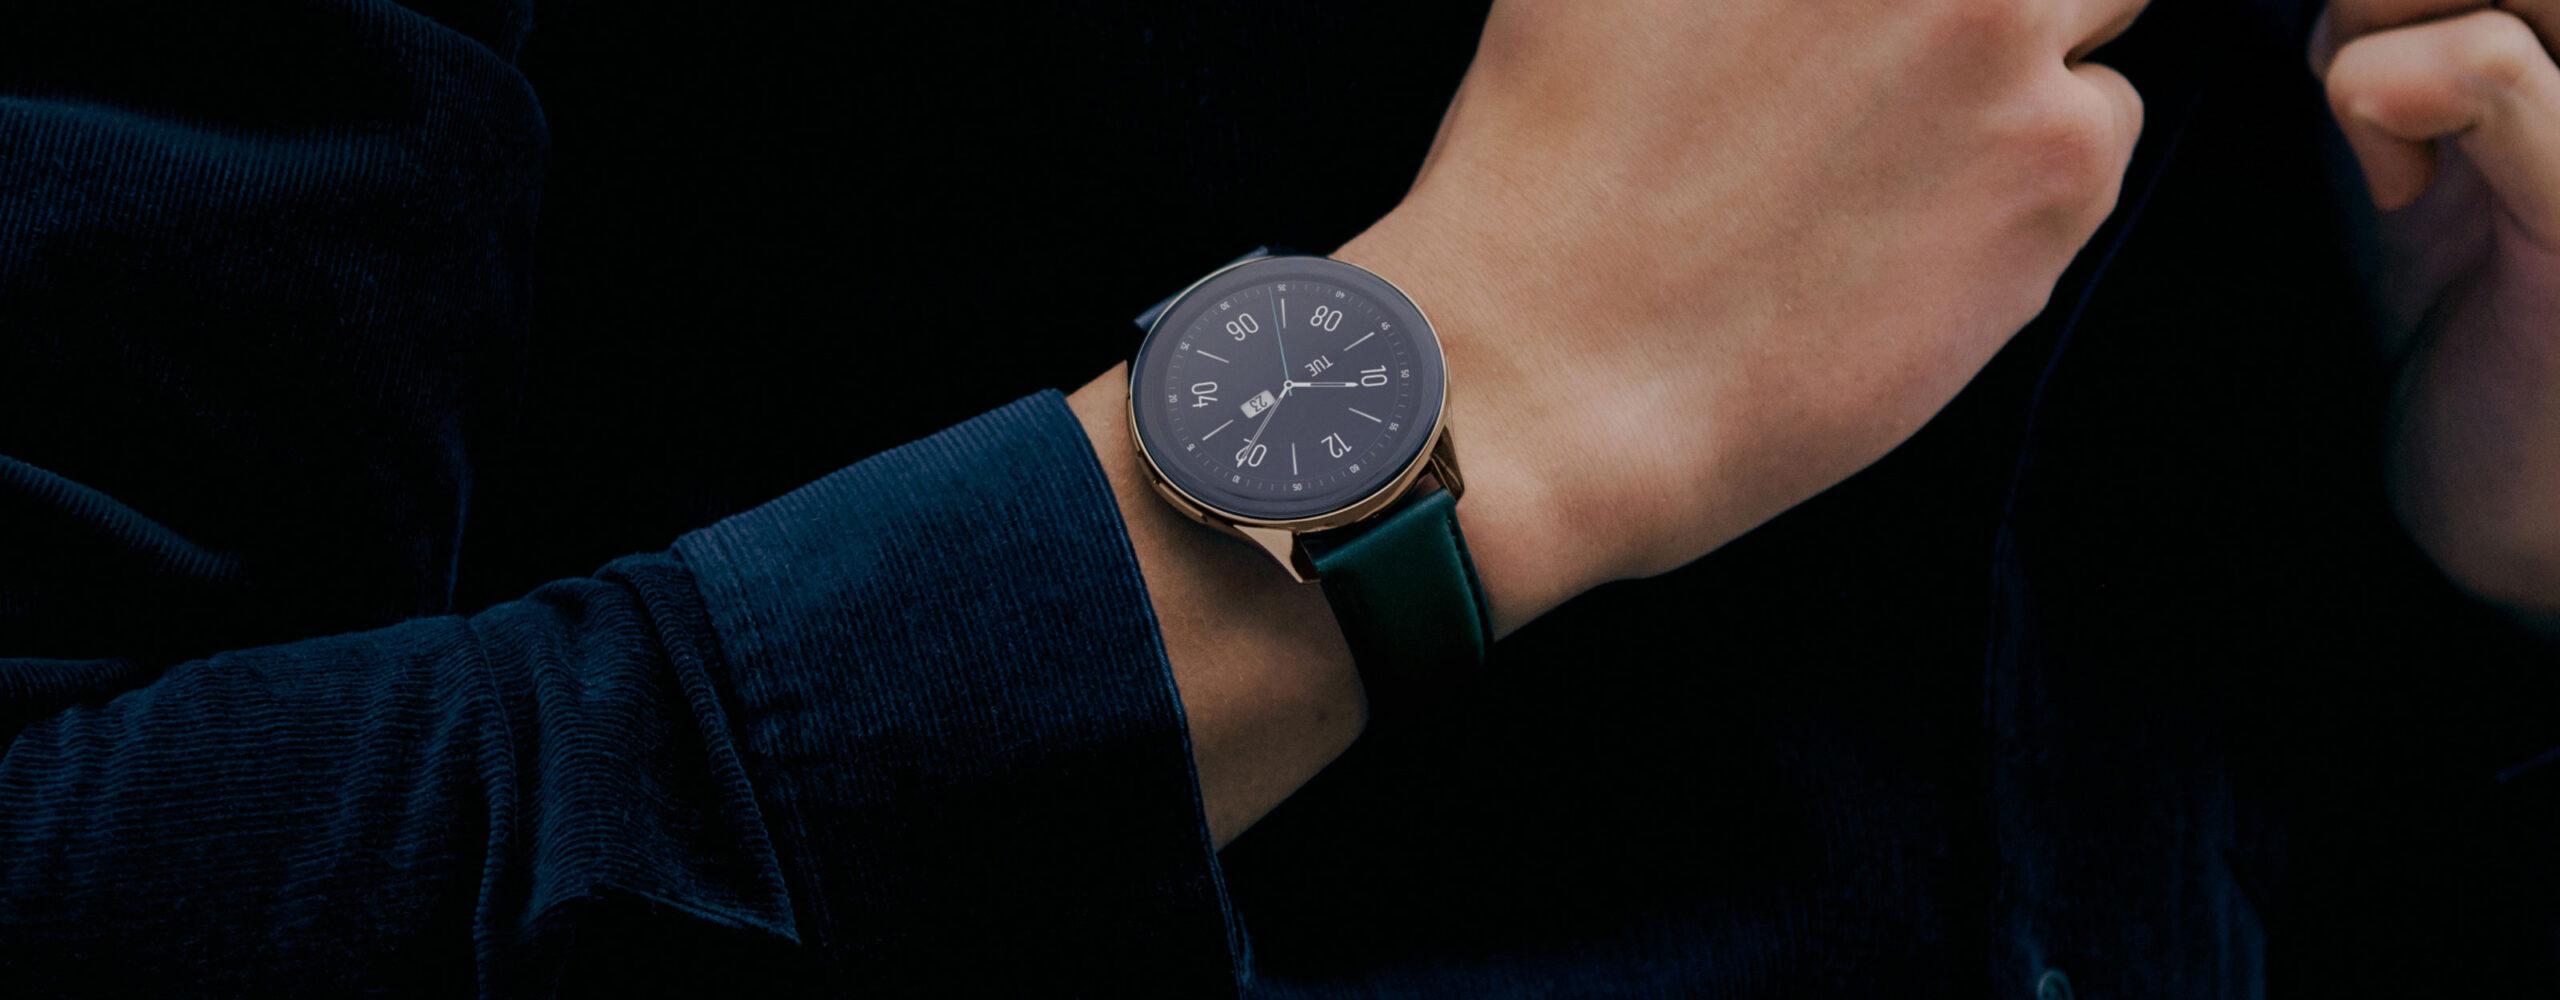 OnePlus Watch - Elegant